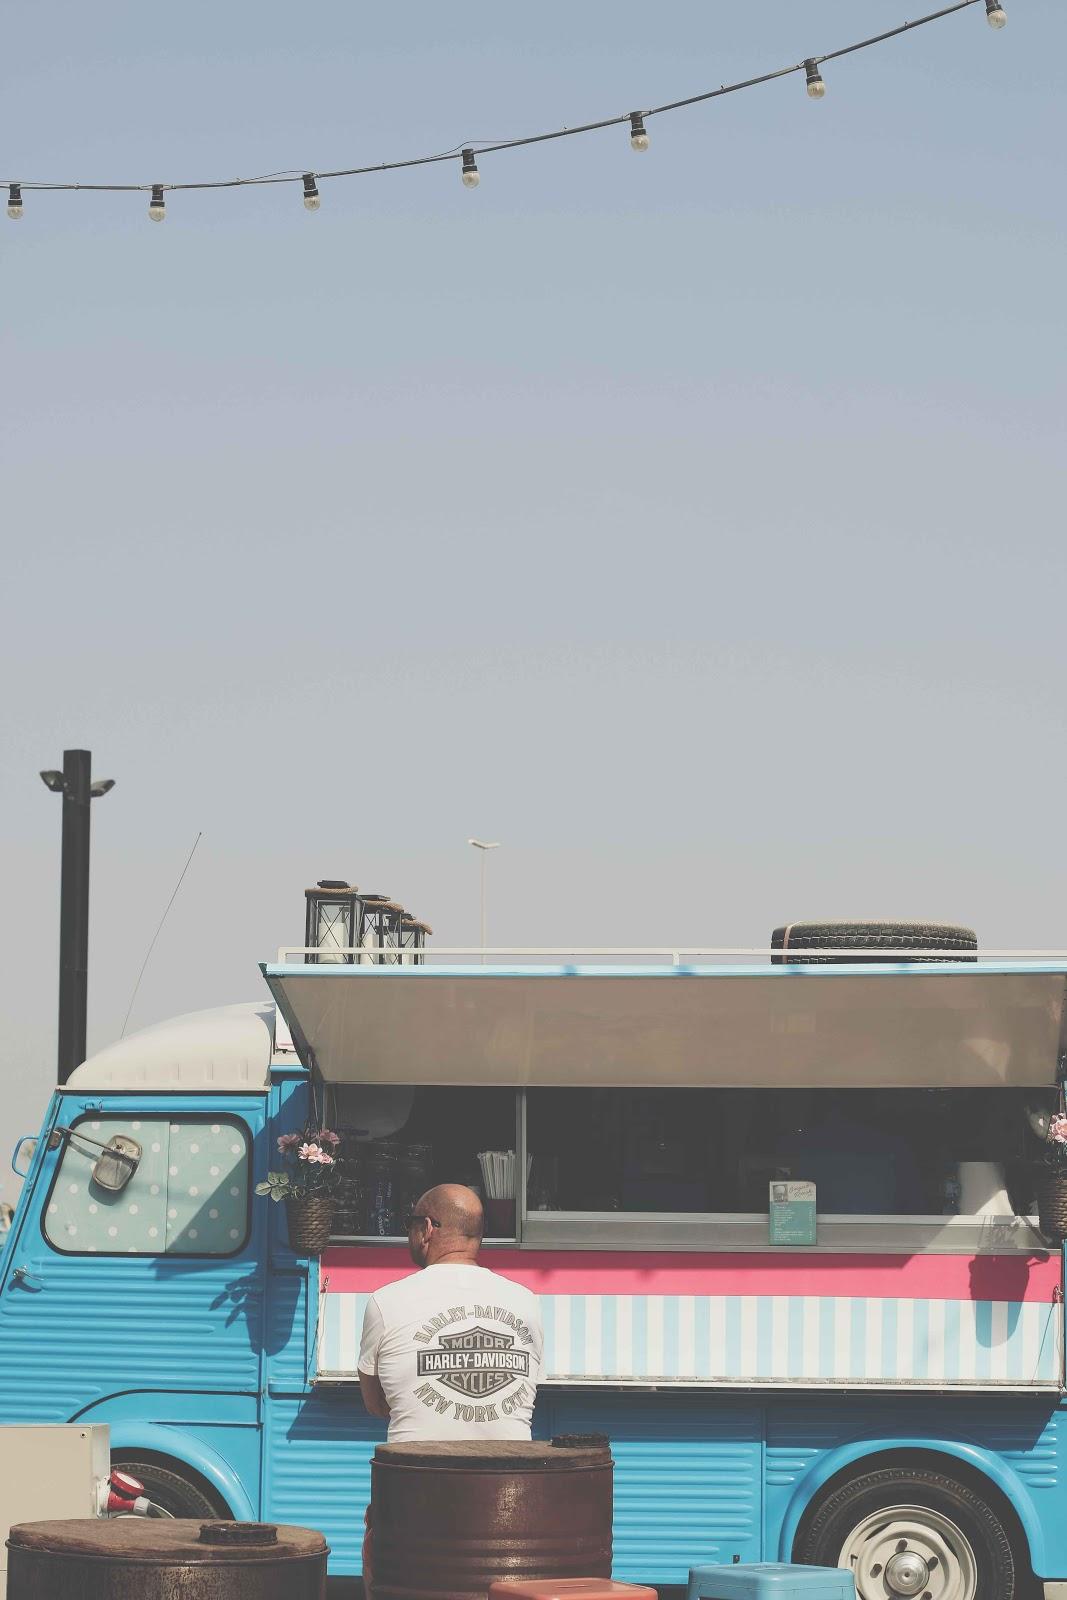 blue vintage food truck